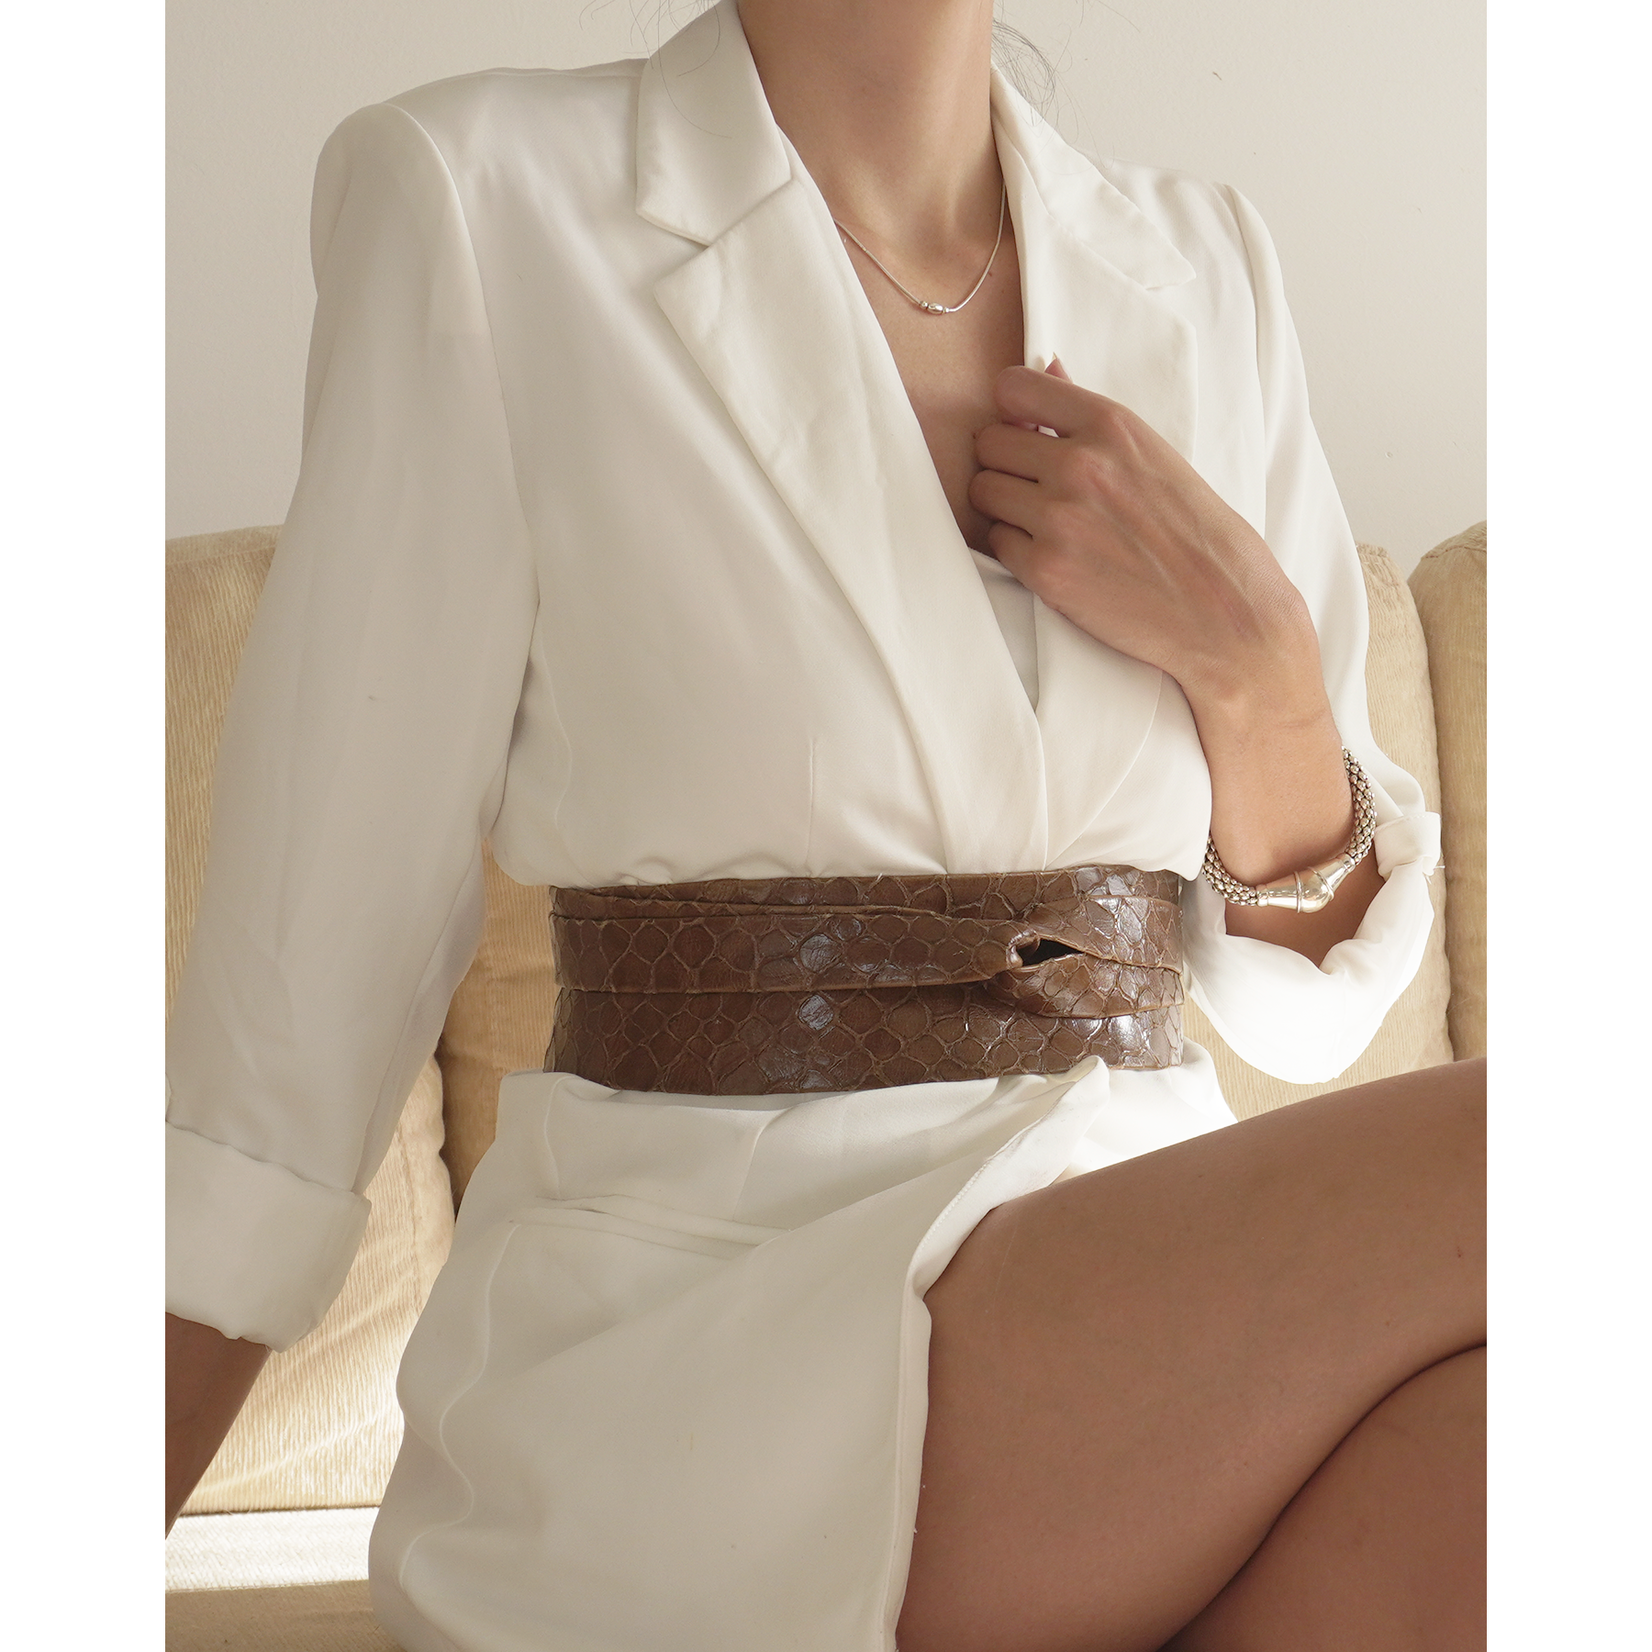 ADA Original Leather Wrap Belt in Choc Tortoise